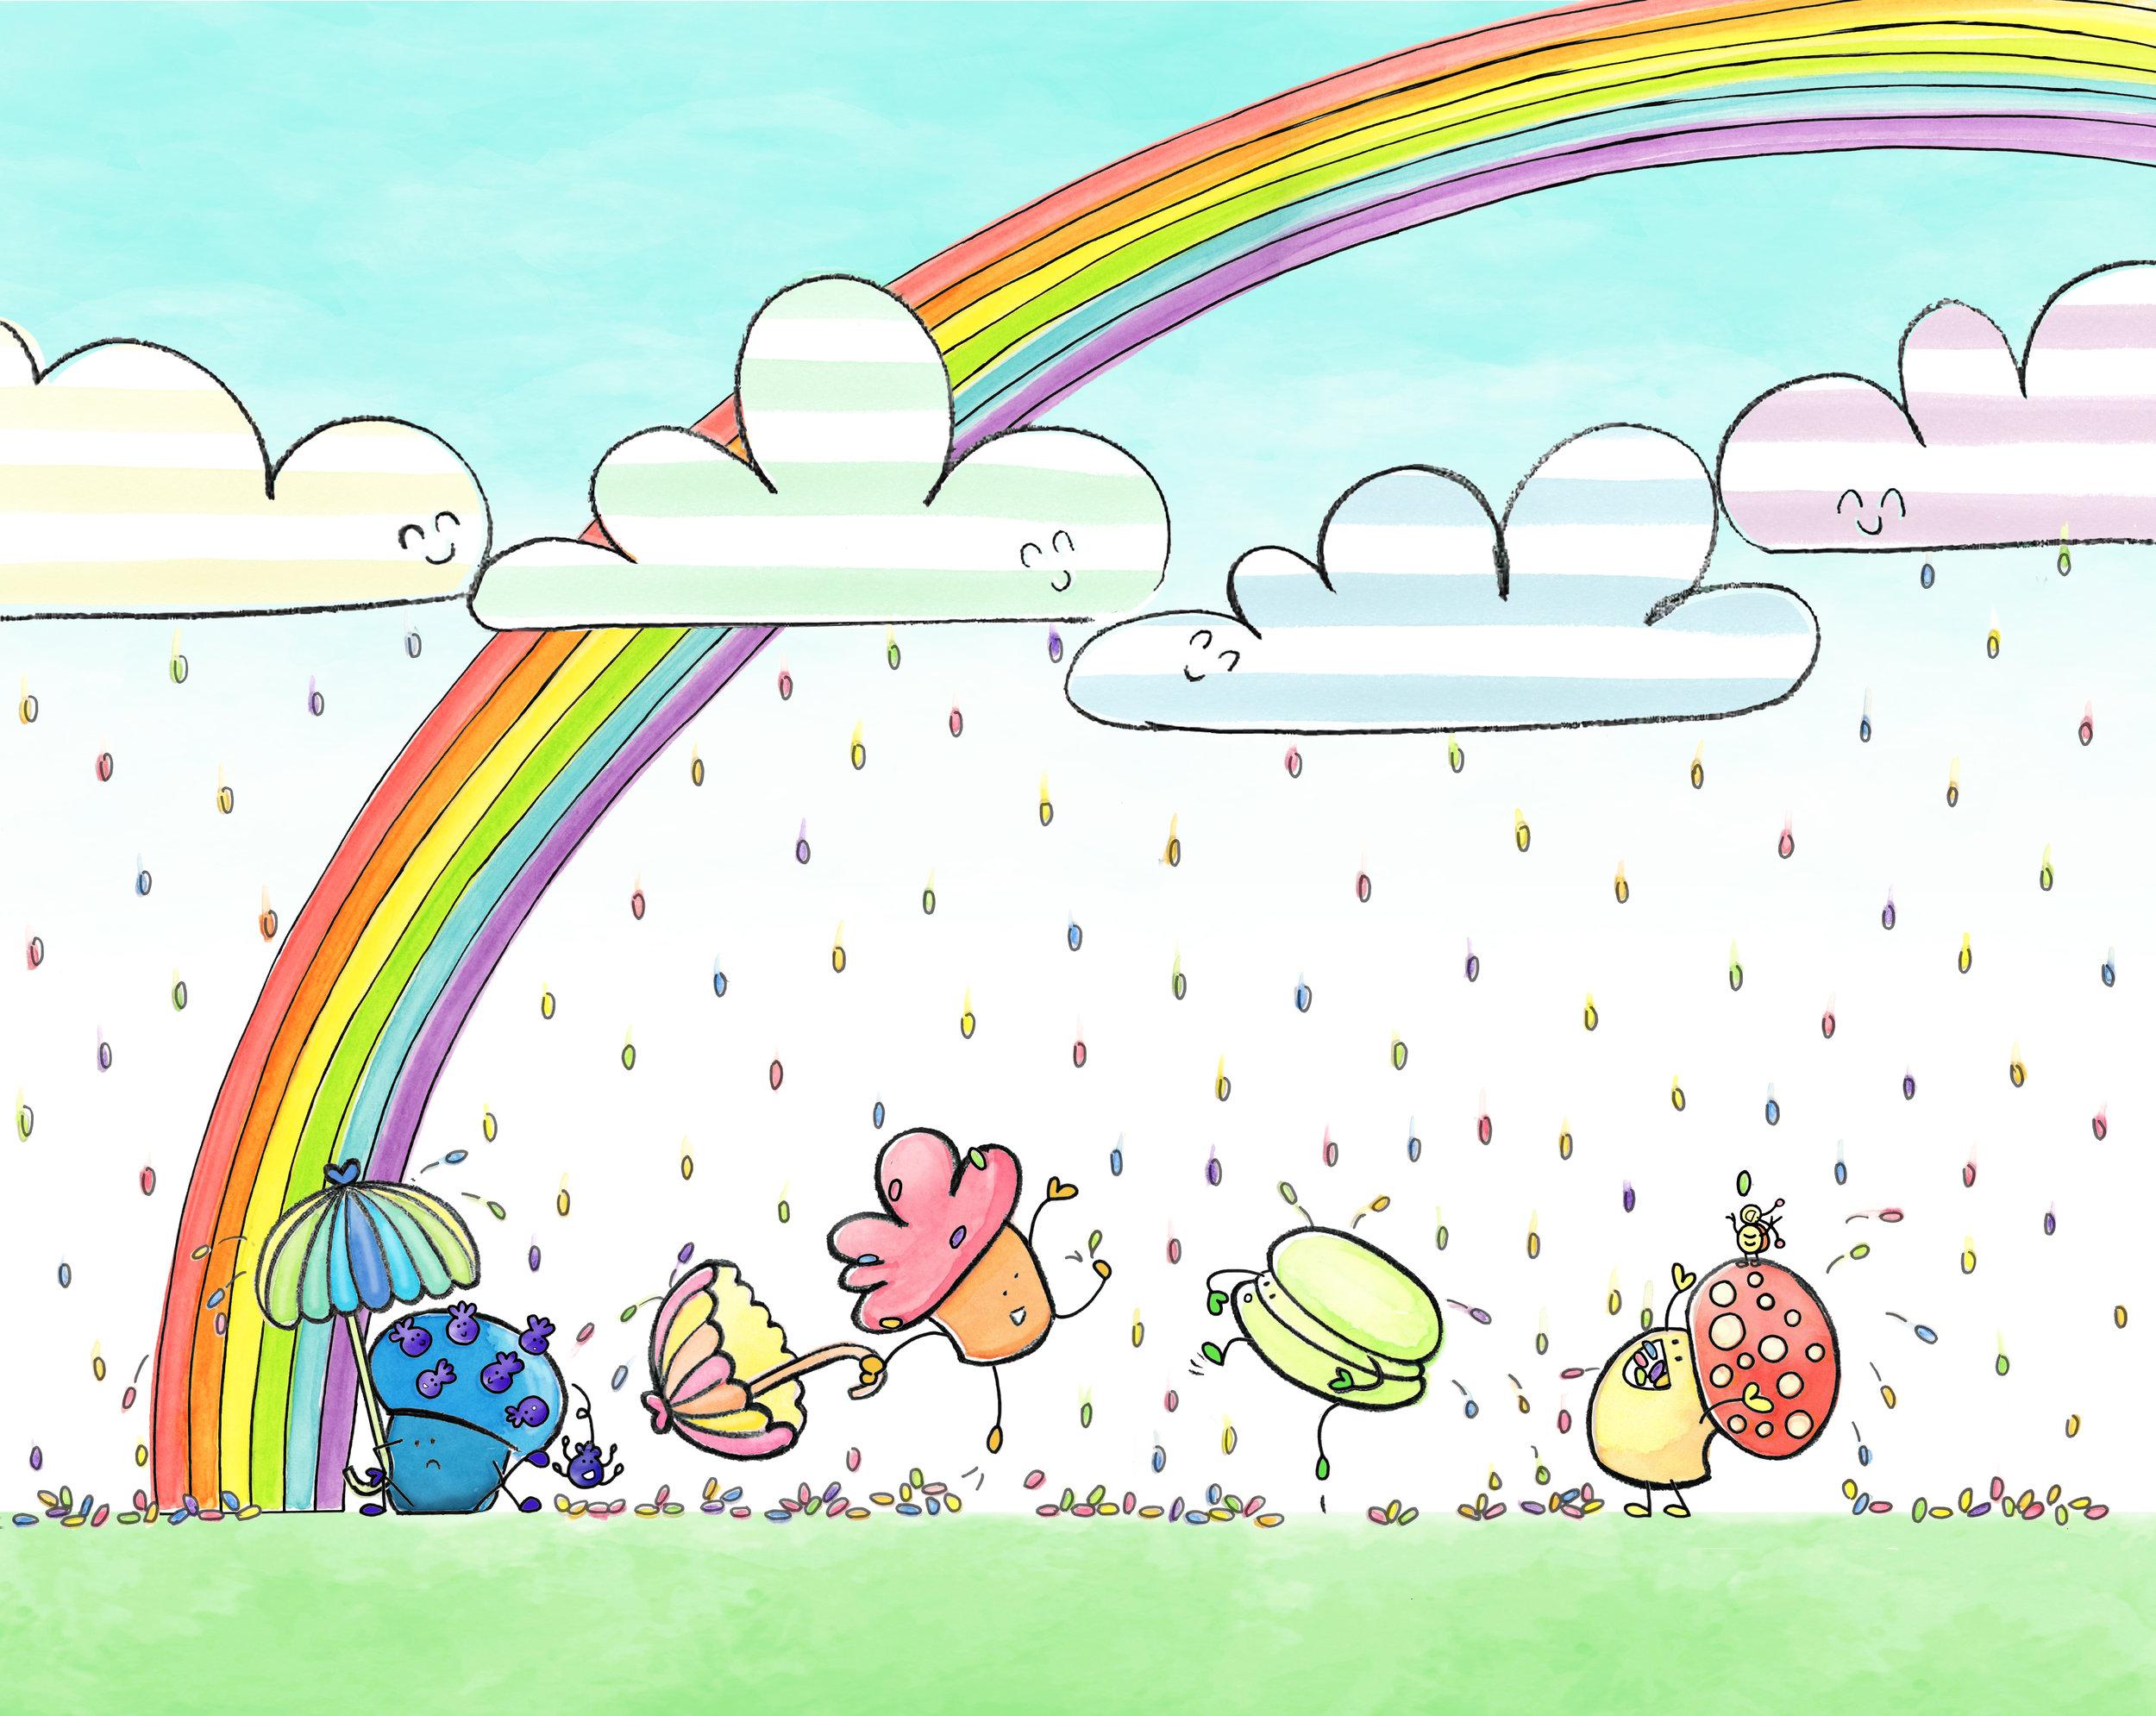 Singing in the Rainbow